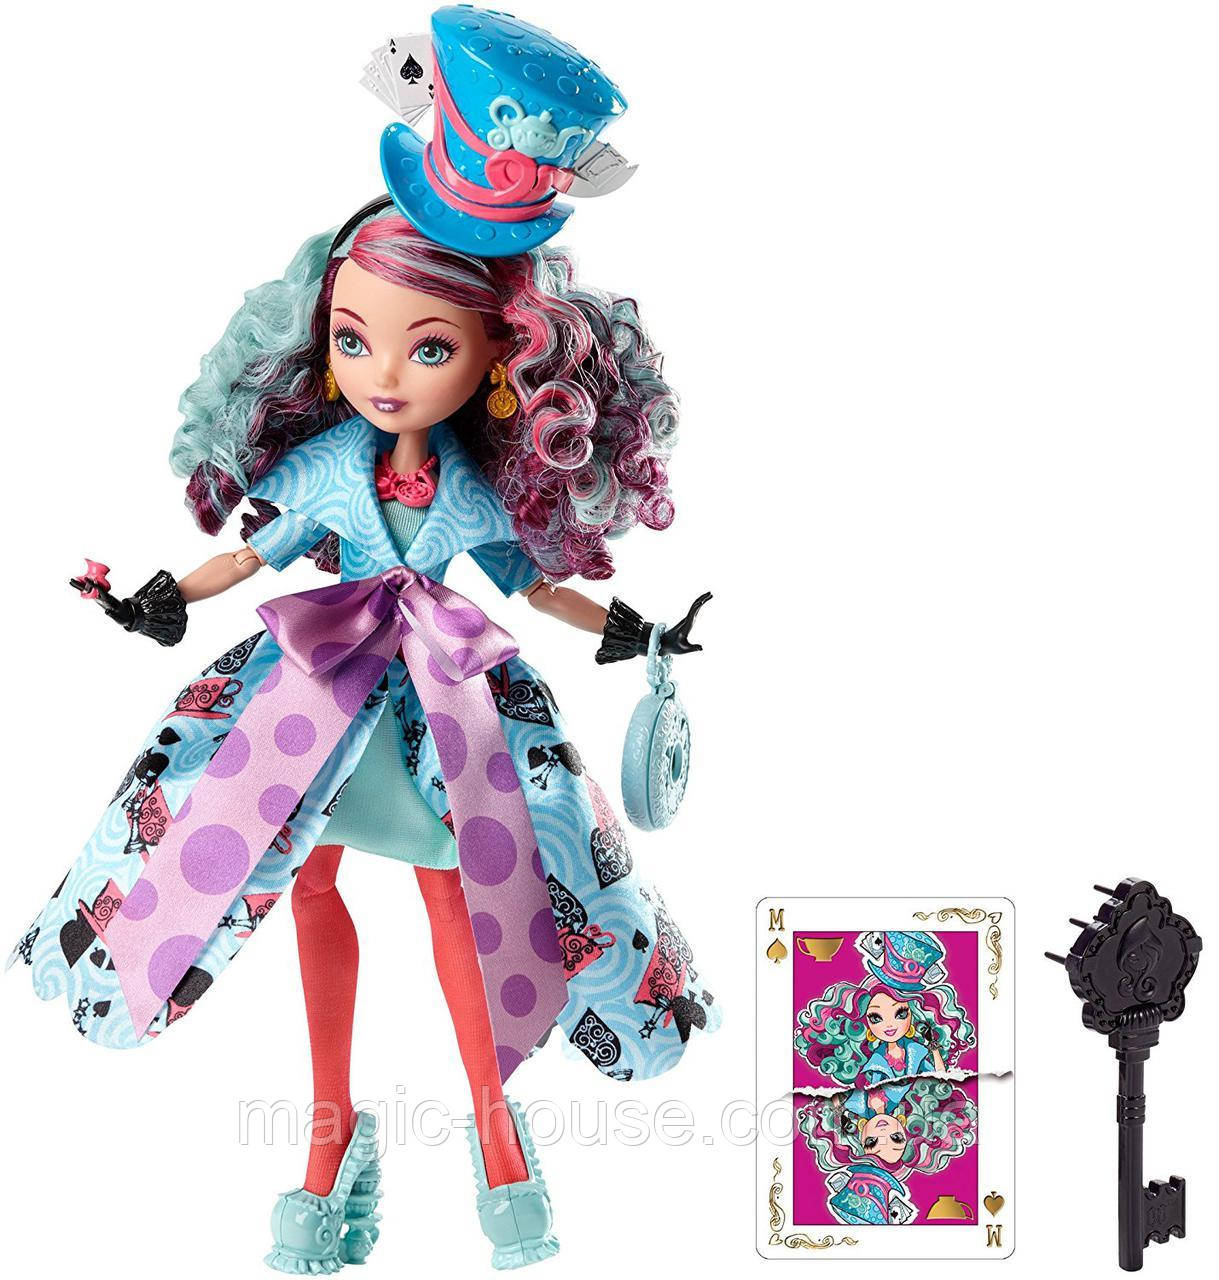 Кукла Эвер Афтер Хай Мэдлин Хаттер  Путь в Страну Чудес Ever After High Madeline Hatter Doll